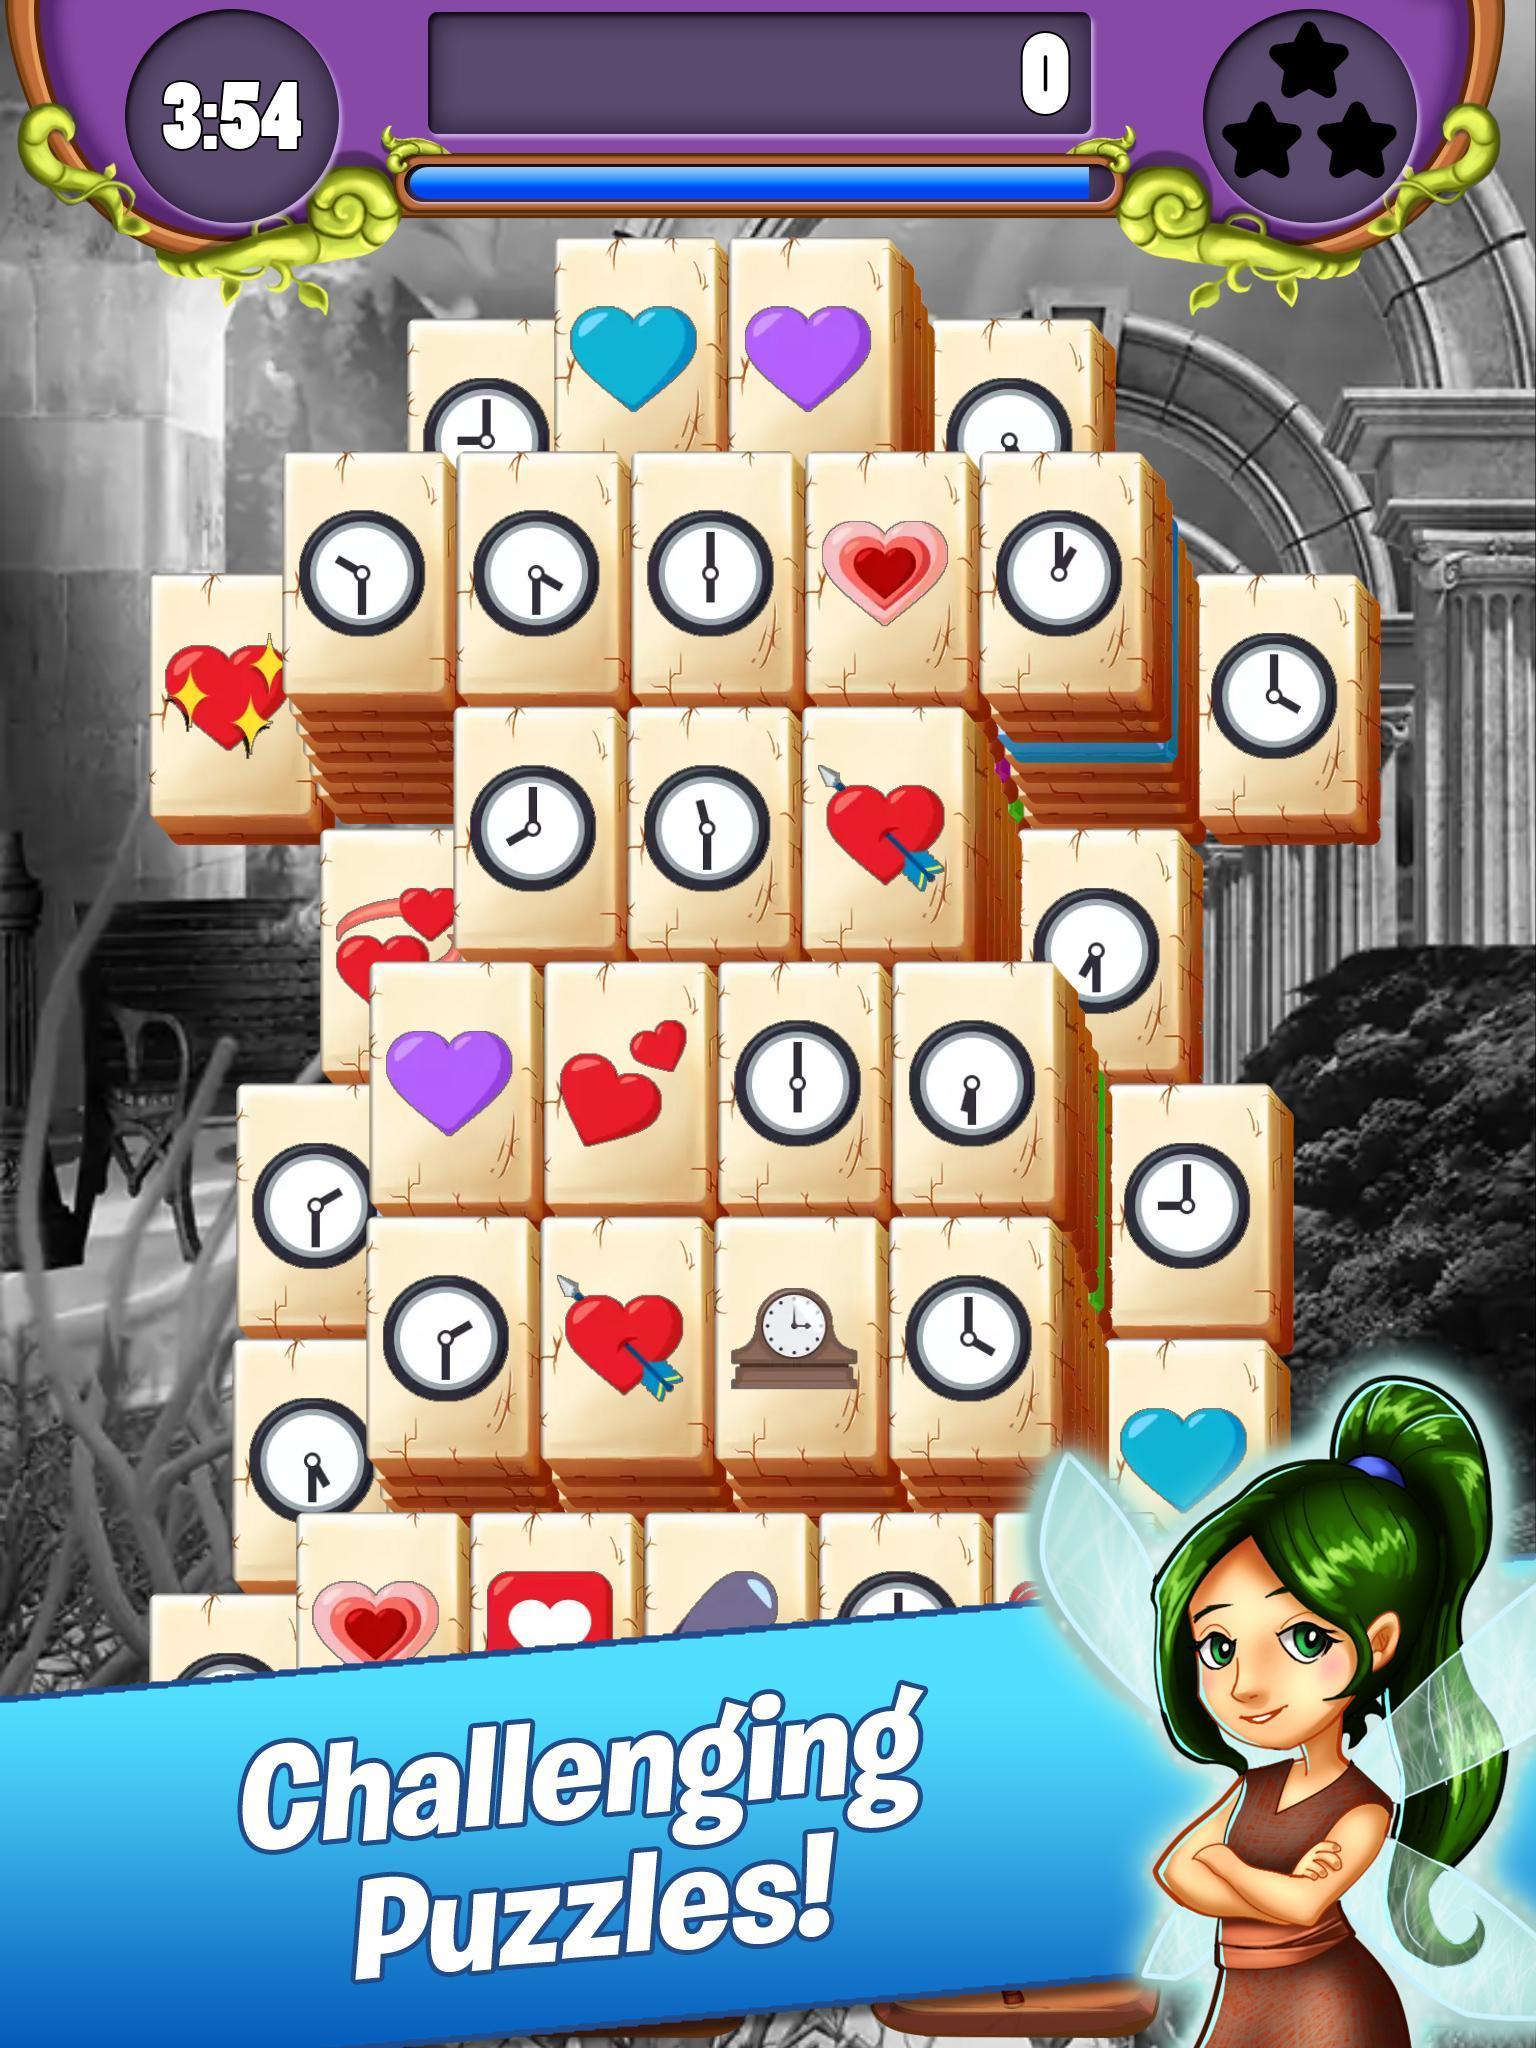 Mahjong - Mermaid Quest - Sirens of the Deep 1.0.42 Screenshot 3